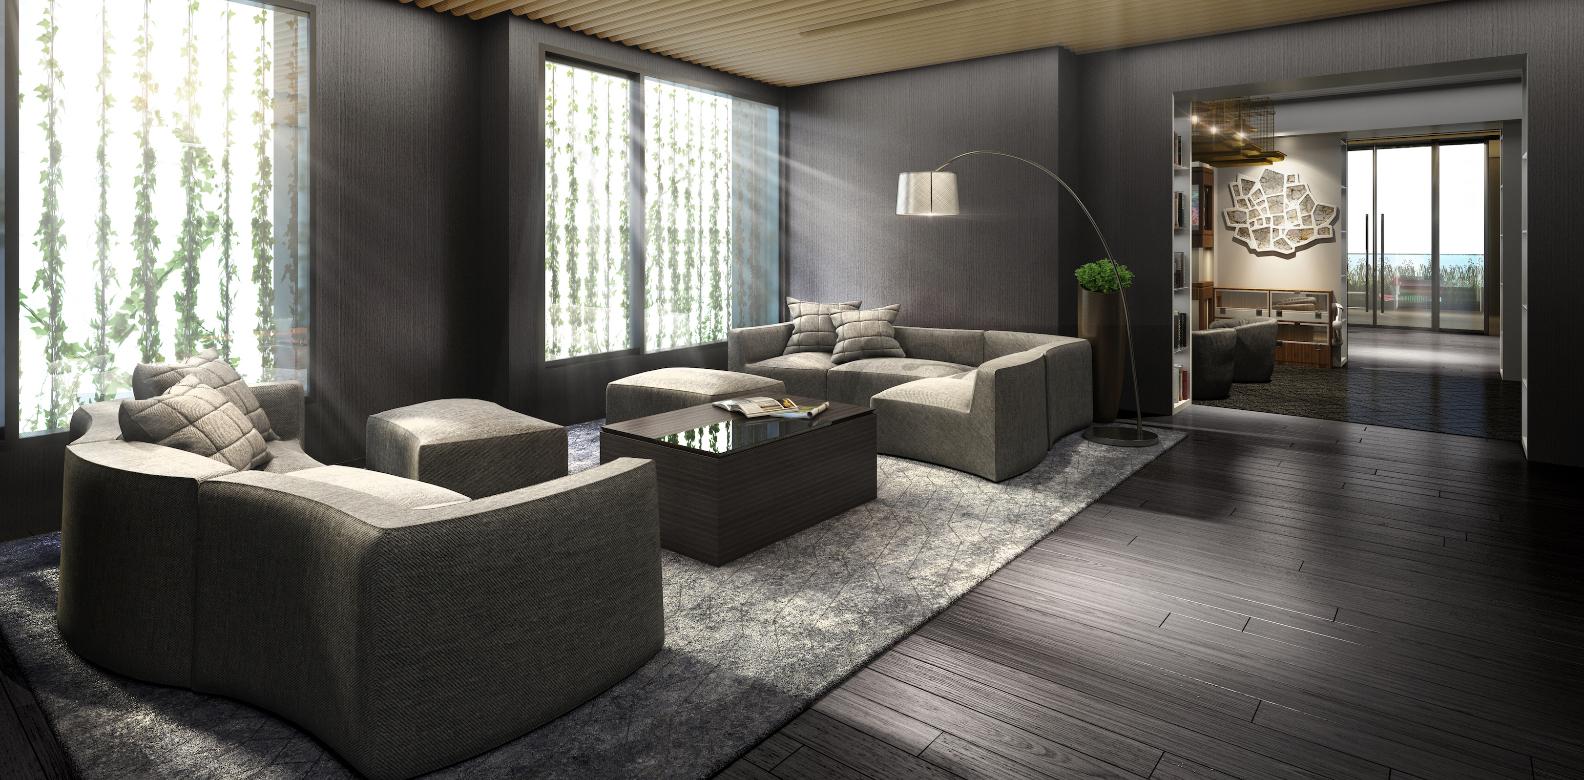 High Quality Can ARTISAN HOUSE Make Sai Ying Pun The Next Brooklyn?